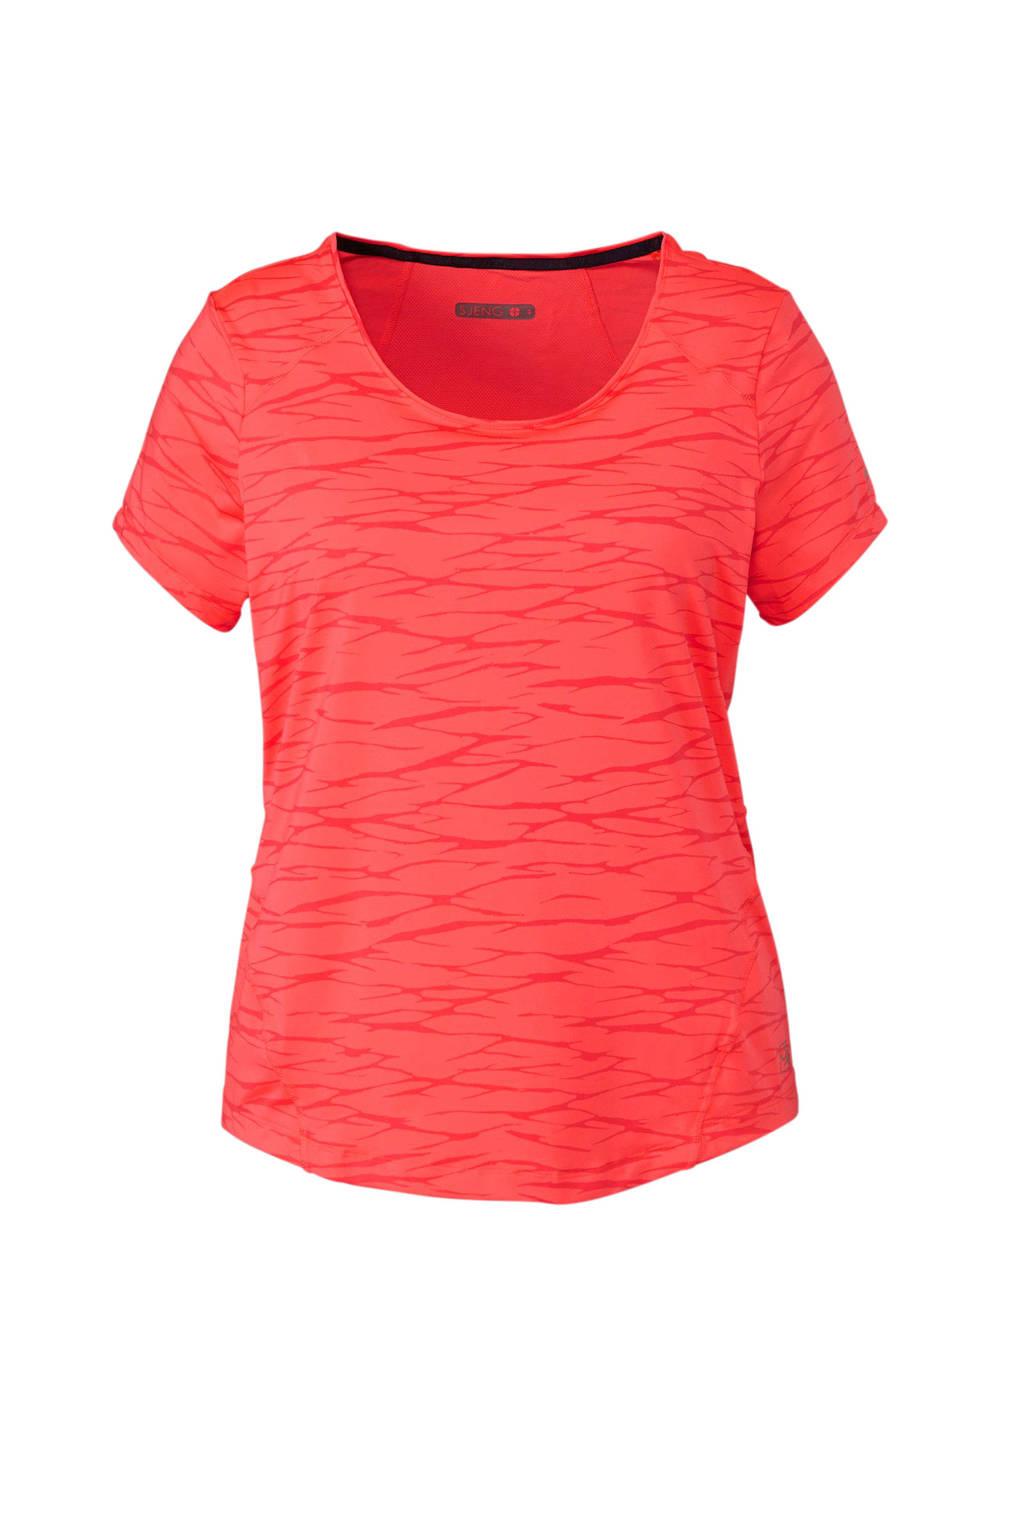 Sjeng Sports Plus T-shirt koraalrood, Koraalrood/roze